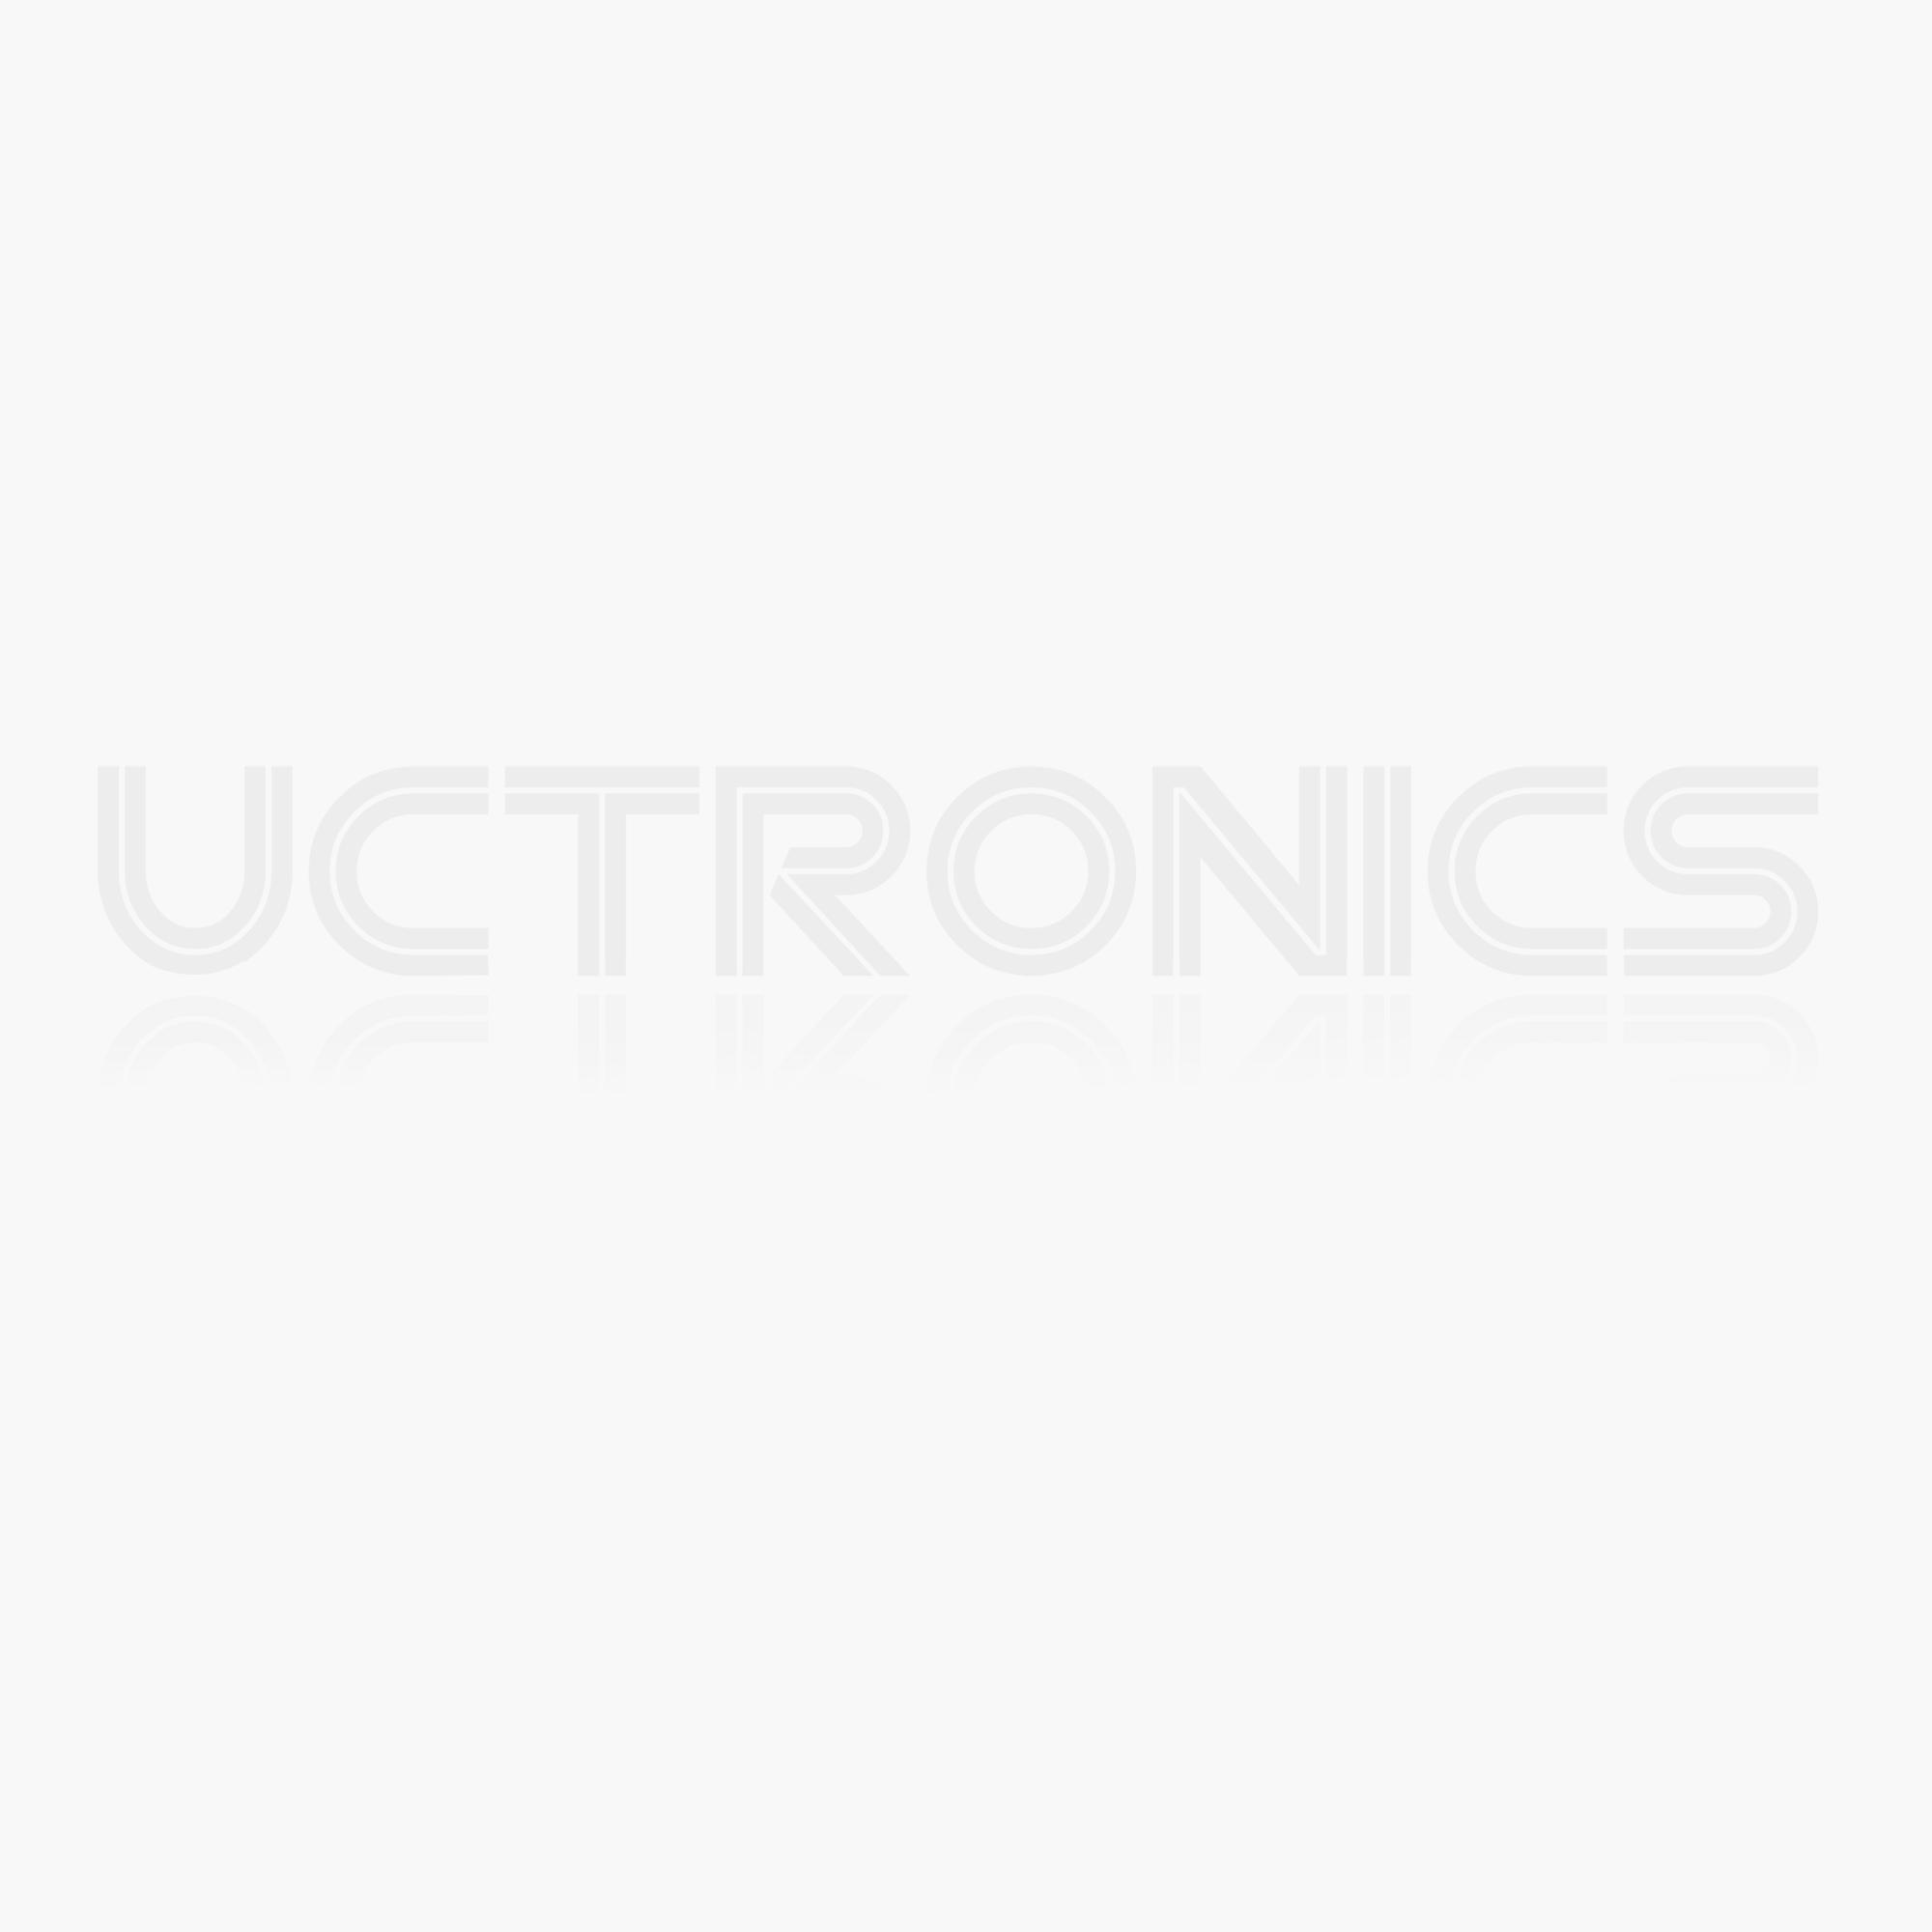 5pcs PL-2303HX PL2303 SSOP-28 SMD 28pin USB to Serial Converter IC Chip